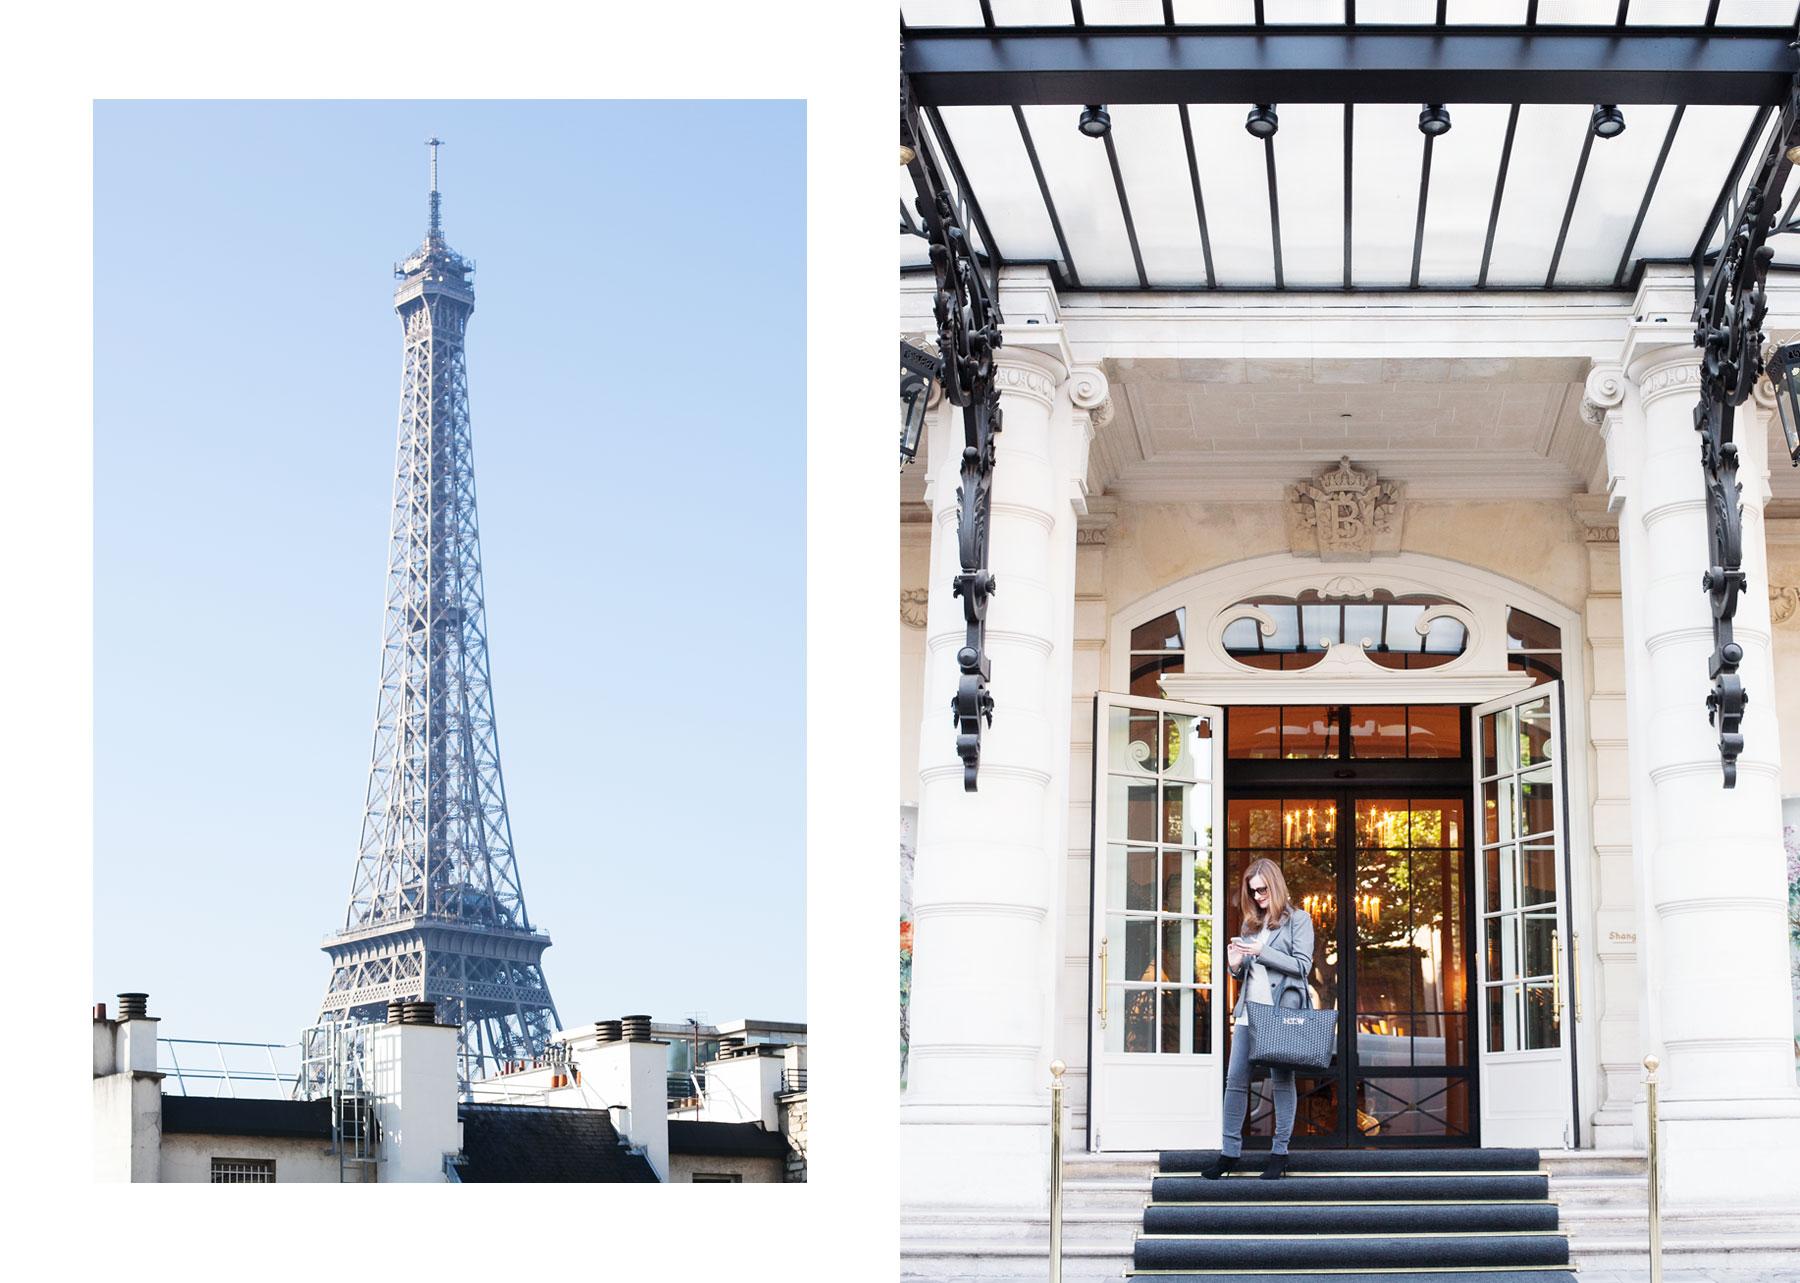 Shangri-La by Carin Olsson (Paris in Four Months)